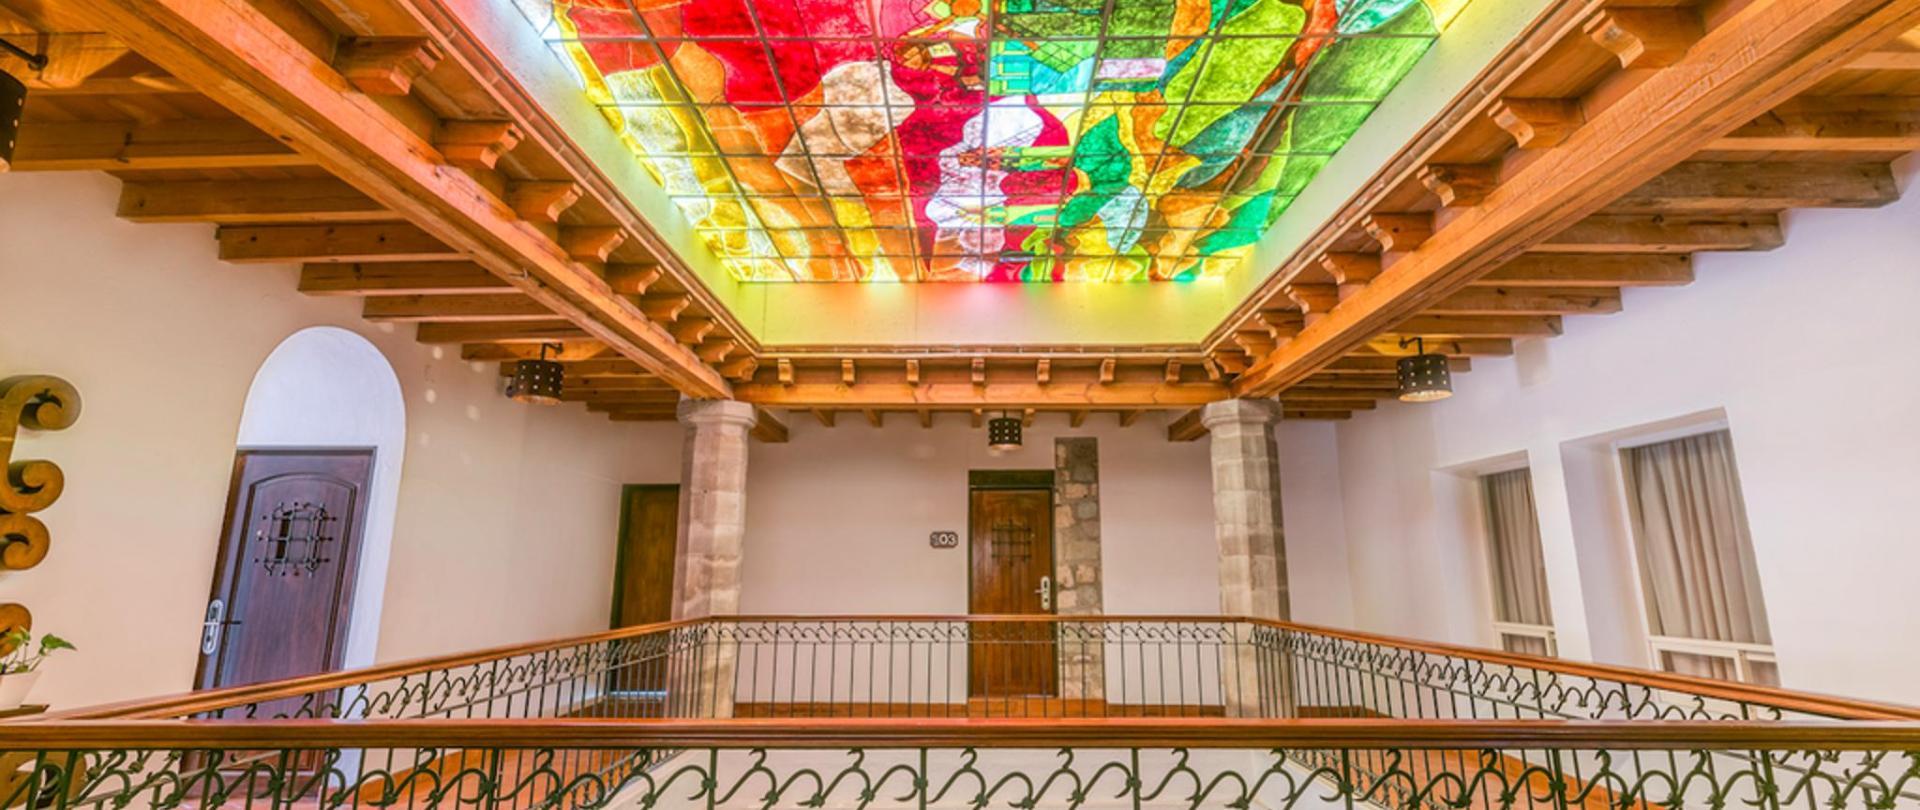 hotel-casa-virreyes-guanajuato17.png